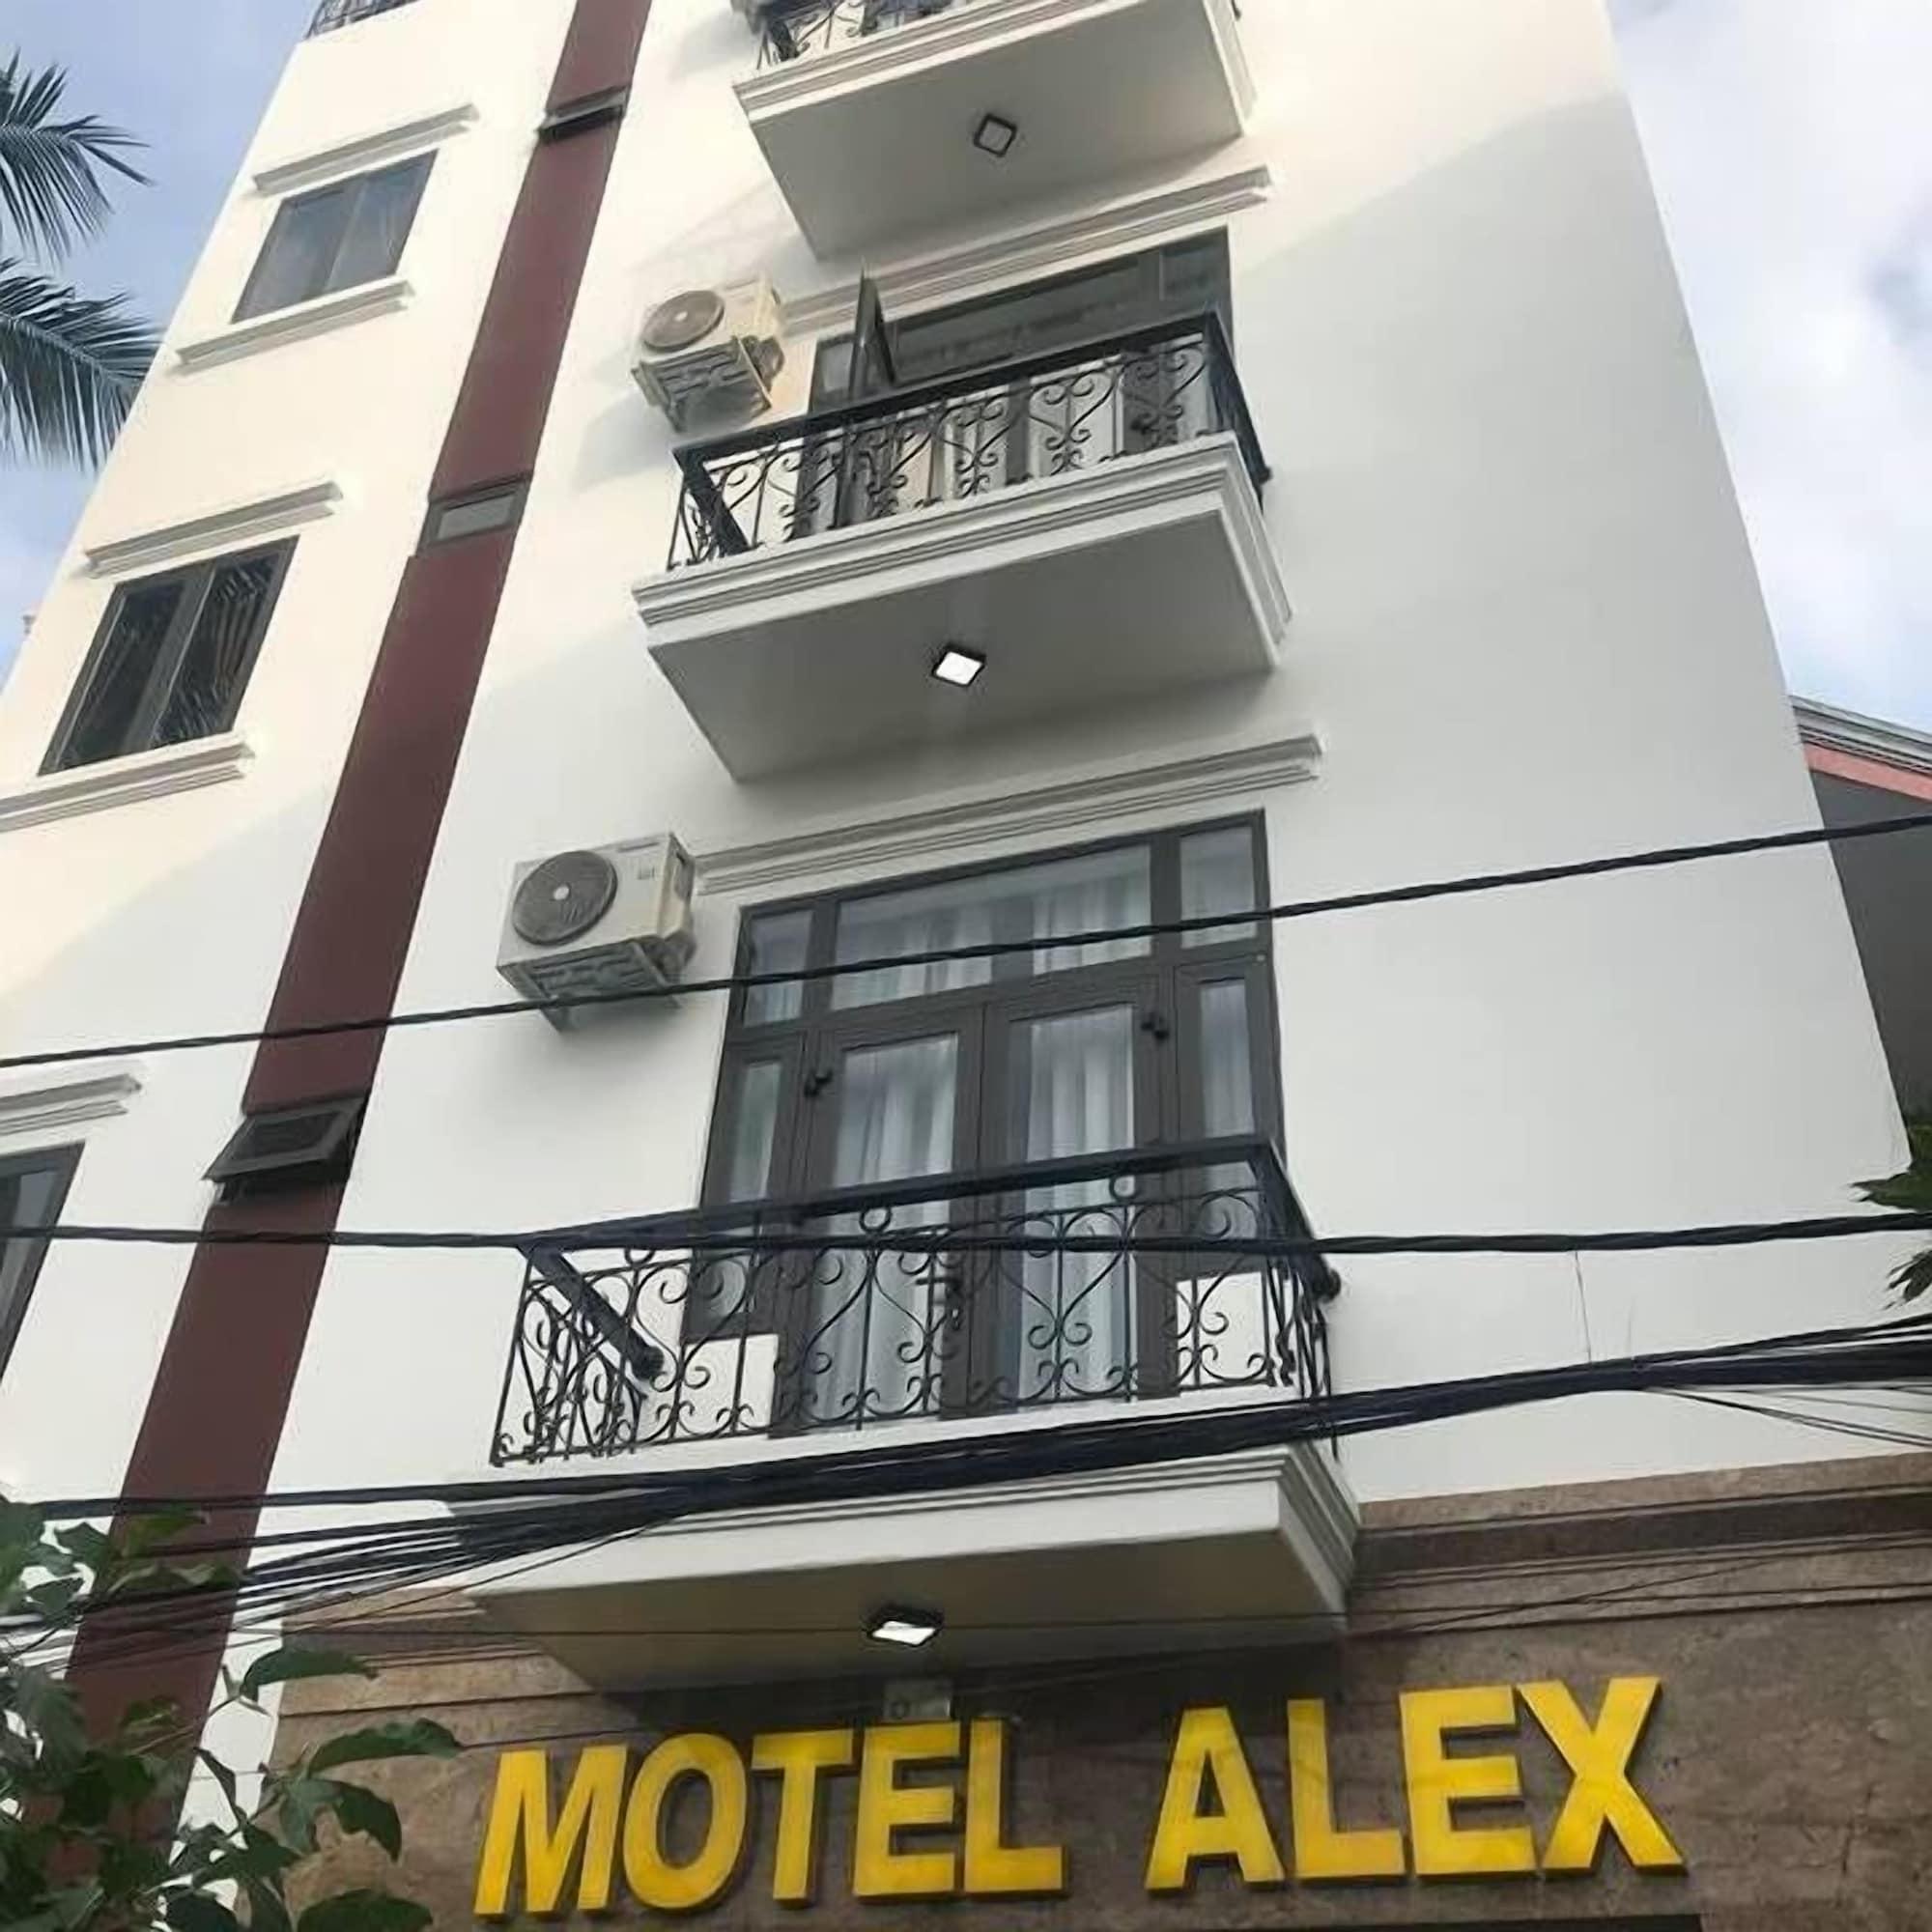 Alex Motel, Hải Châu